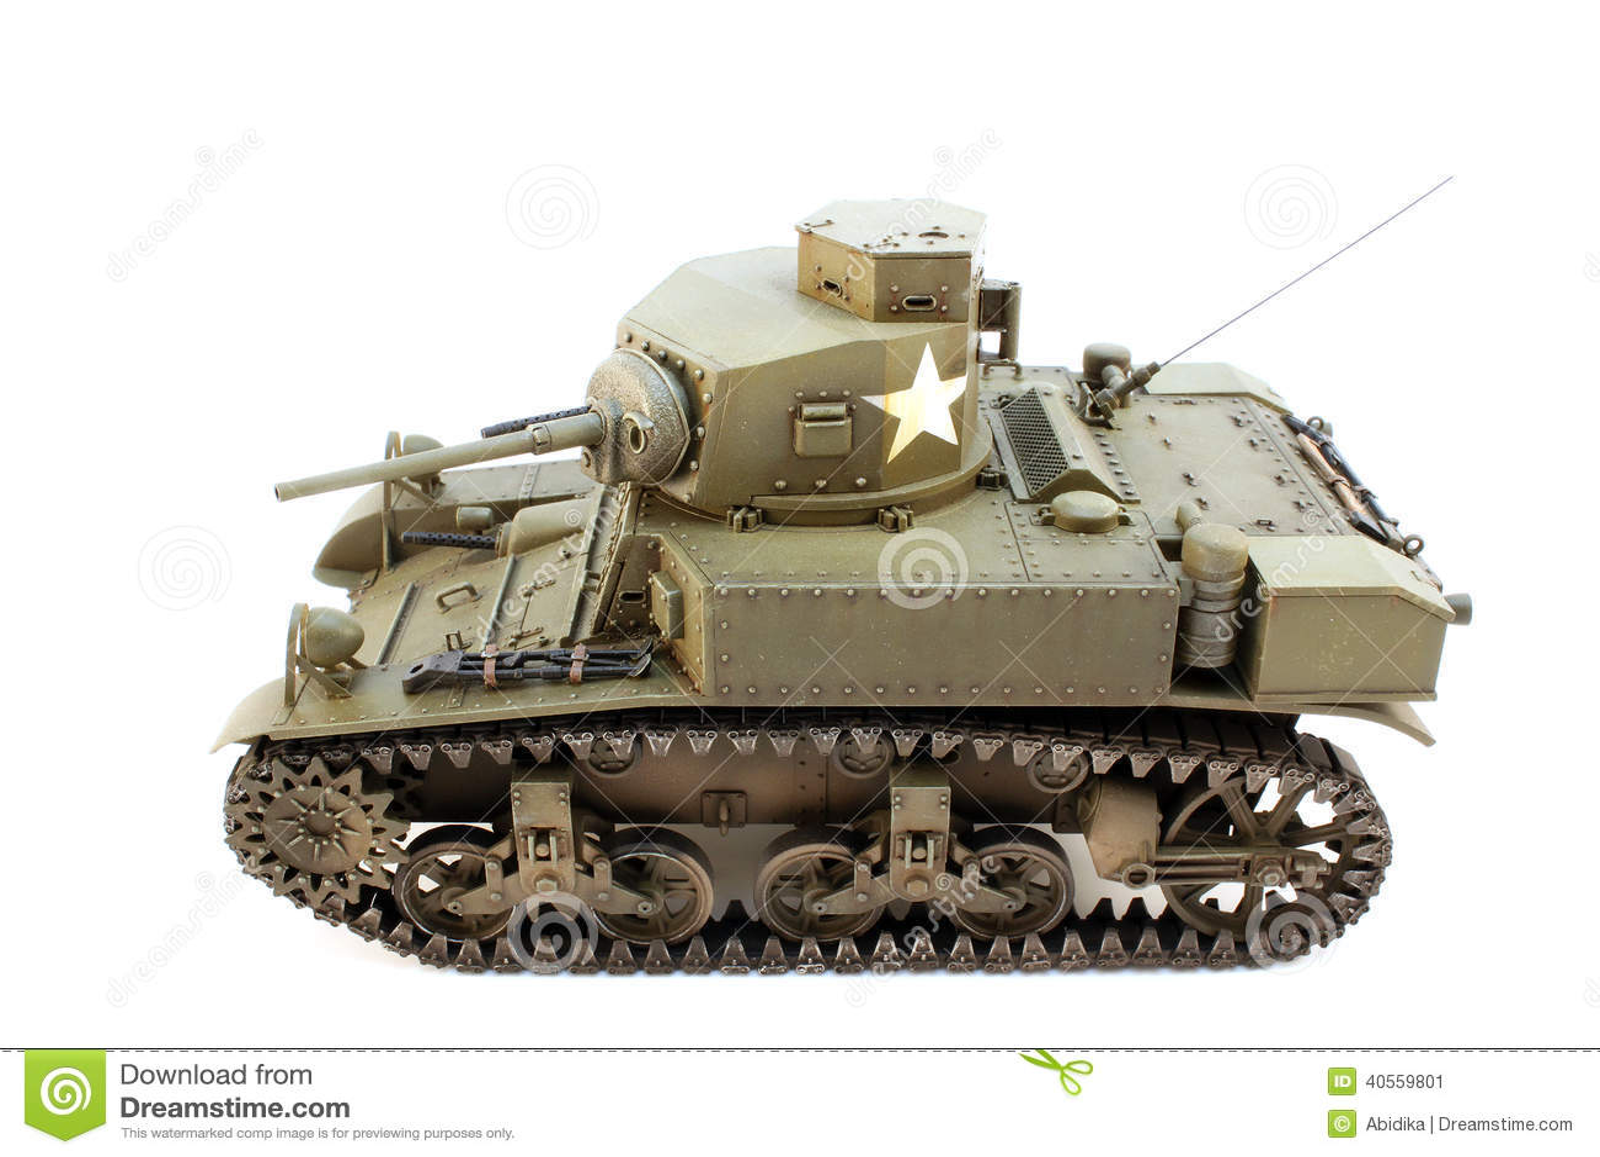 foto carro combate: